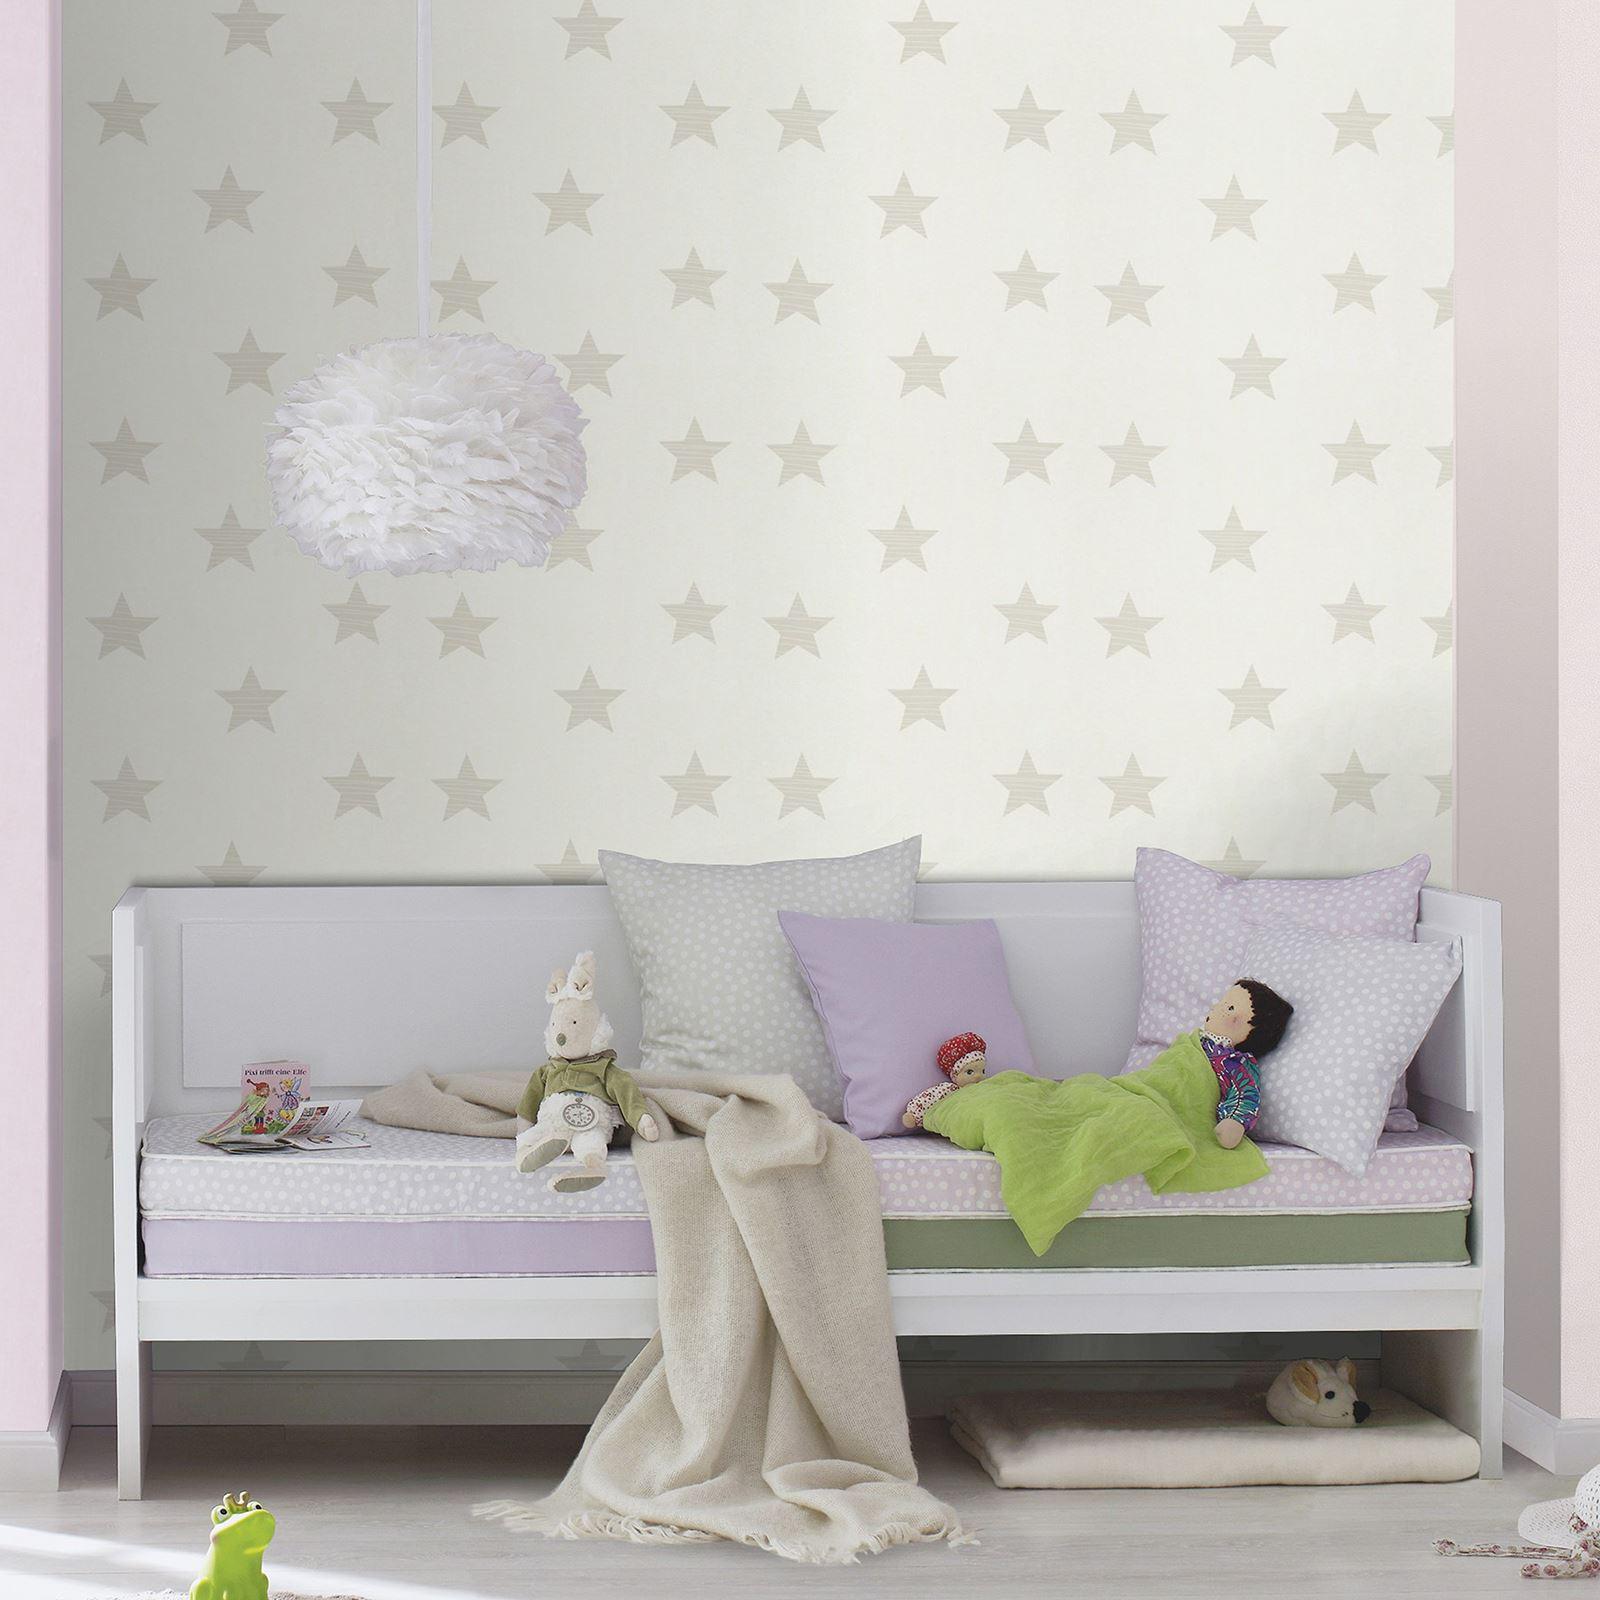 Tapete kinderzimmer sterne  gepunktet, Sterne, Hearts & Rosenknospen Muster Tapete Kinderzimmer ...